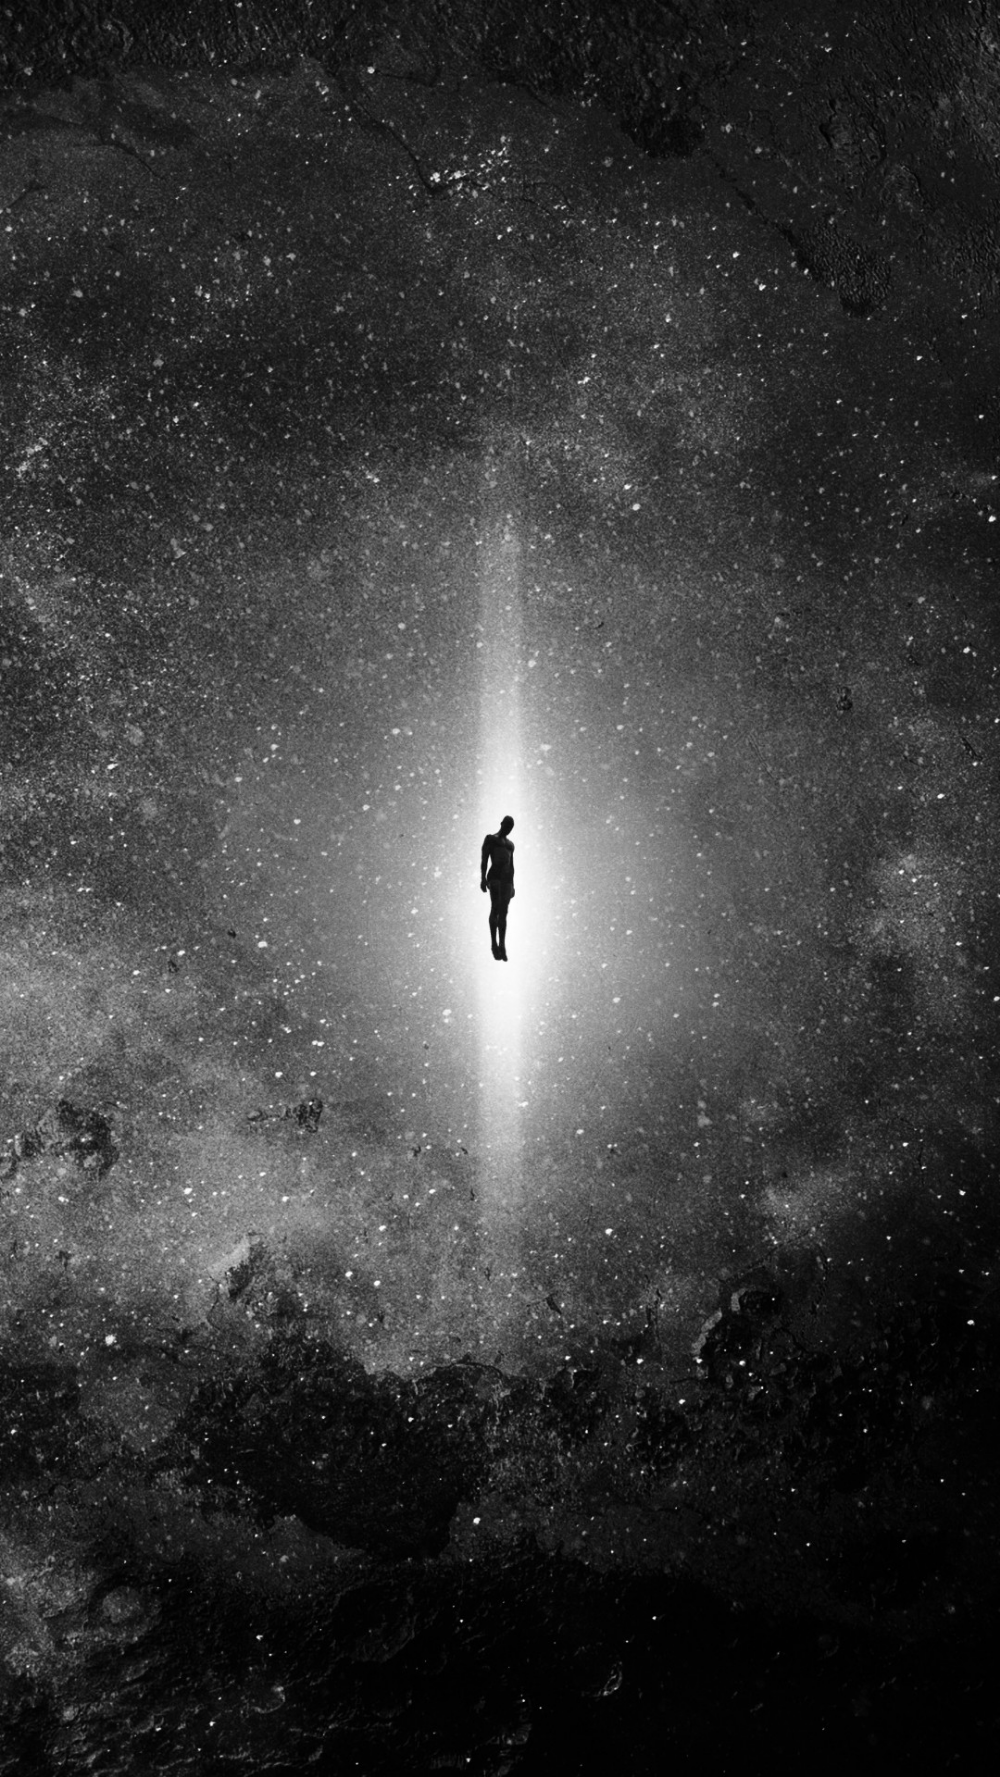 Pin by RitaB3 🌸 on Dark Mode in 2020 Black wallpaper